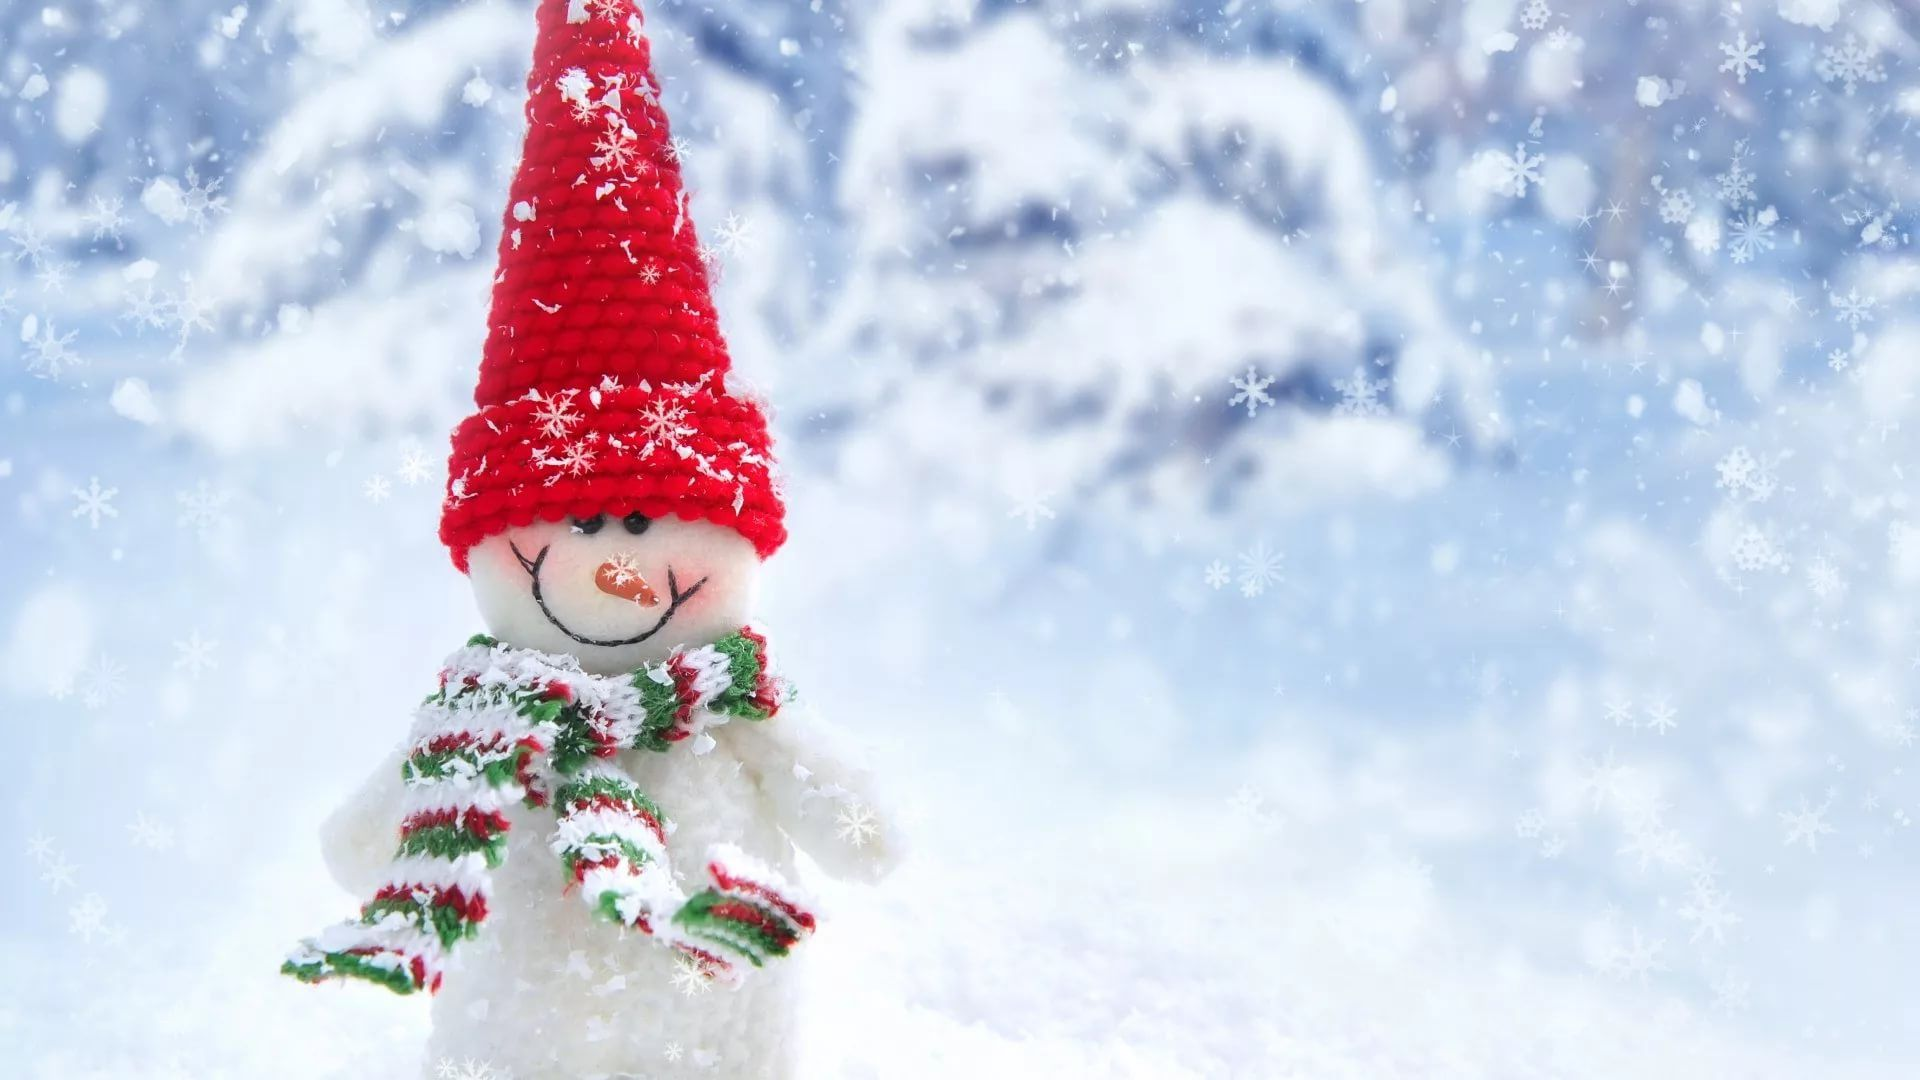 Cute Winter wallpaper image hd